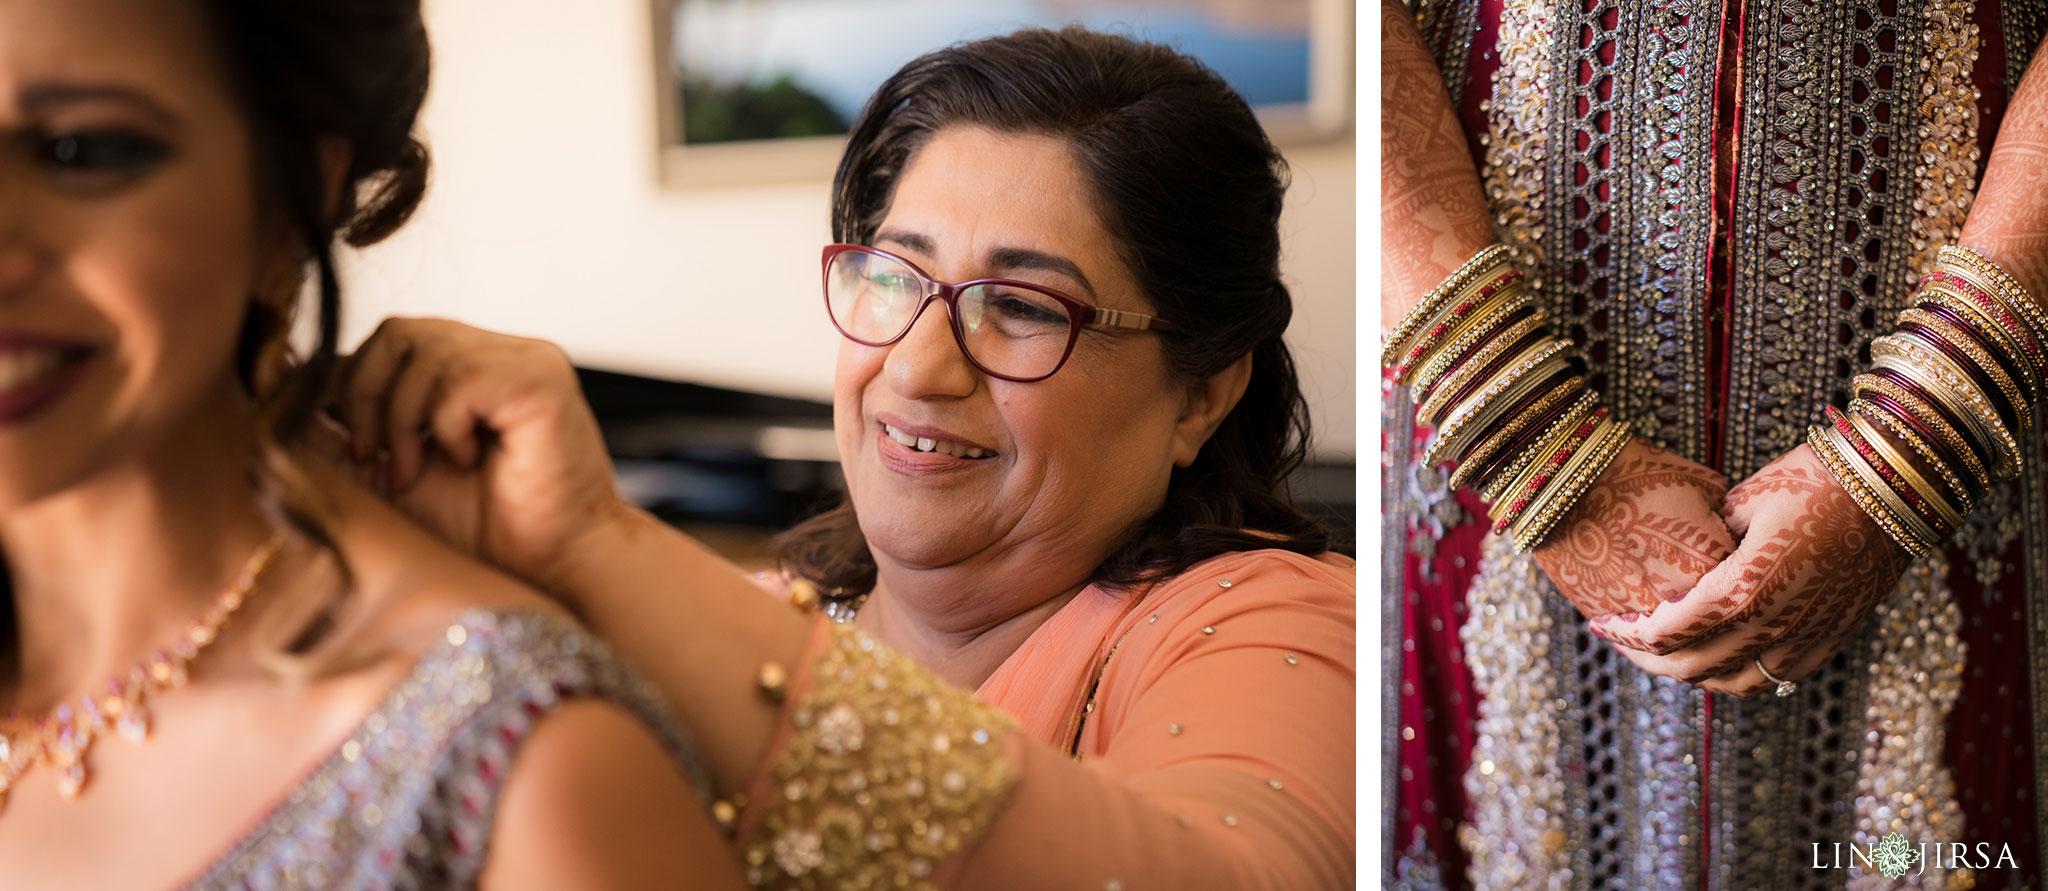 02 altadena town country club pakistani bride wedding photography